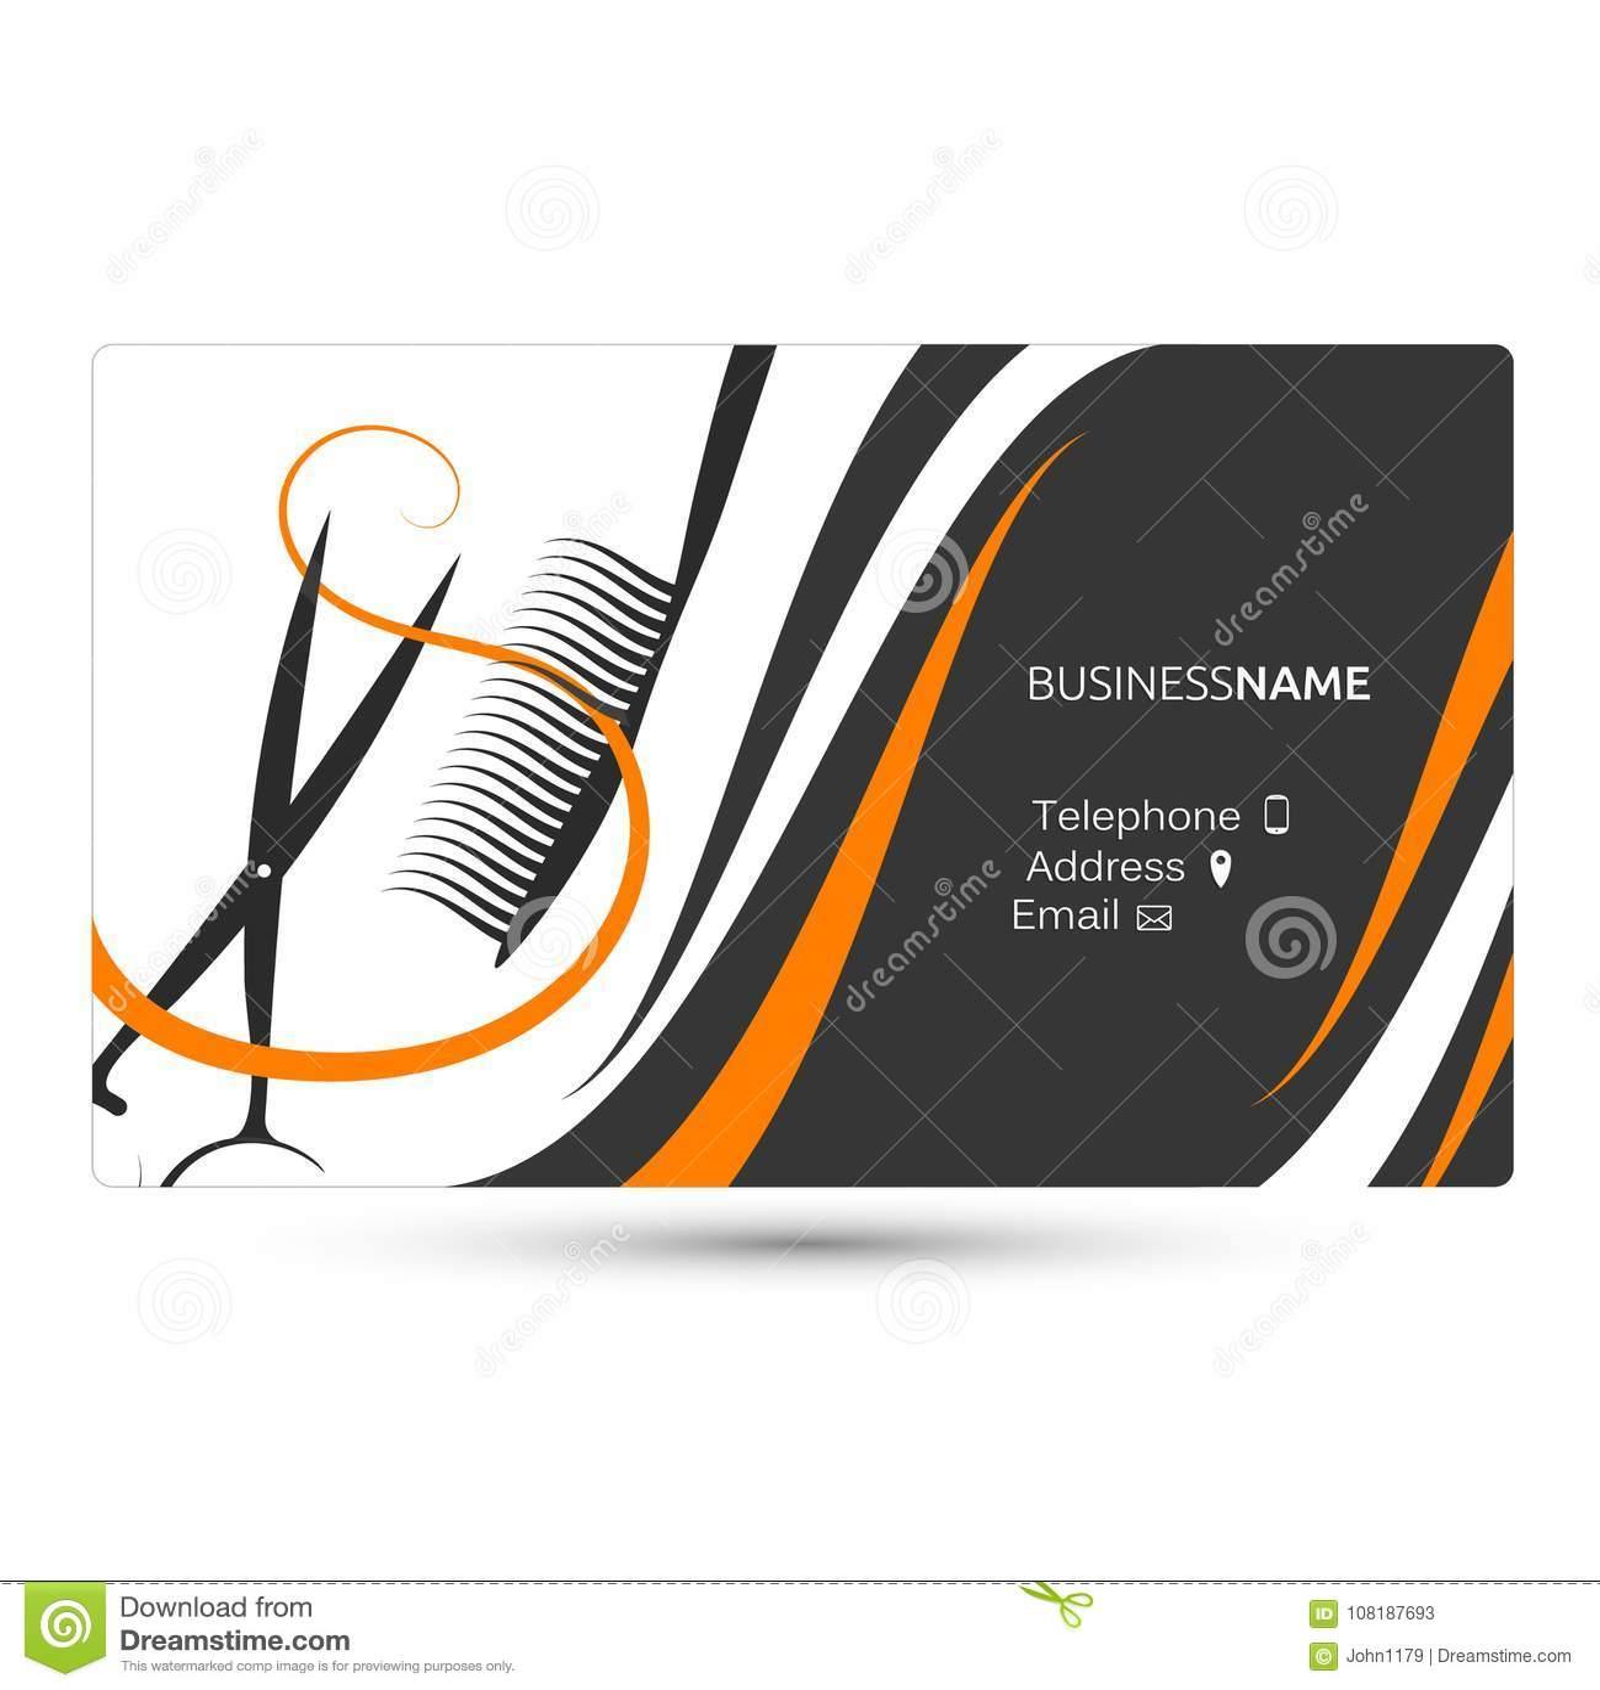 Hairdressing salon business card stock vector illustration of flat download hairdressing salon business card stock vector illustration of flat cards 108187693 colourmoves